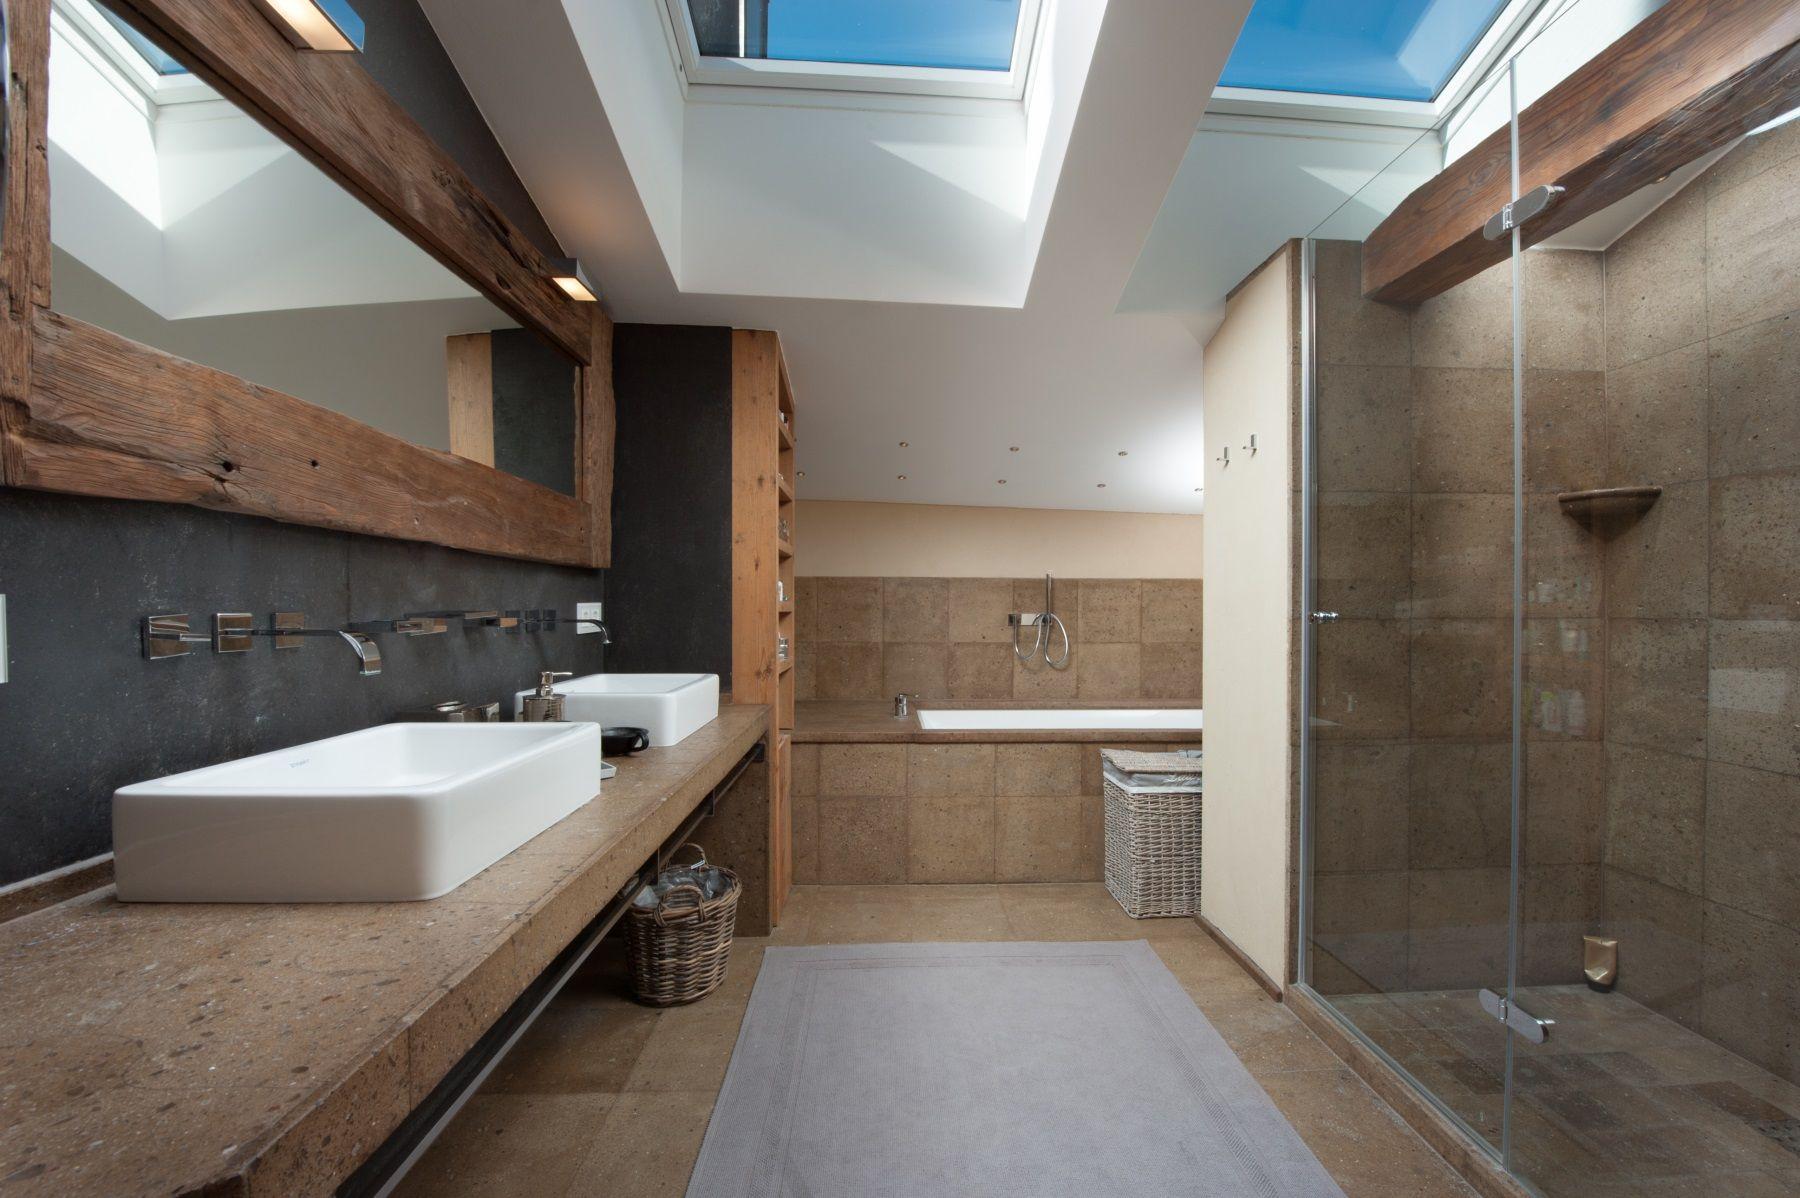 Immobilien kitzb hel gro z giges badezimmer unter dem for Immobilien bad fliesen ideen neubau